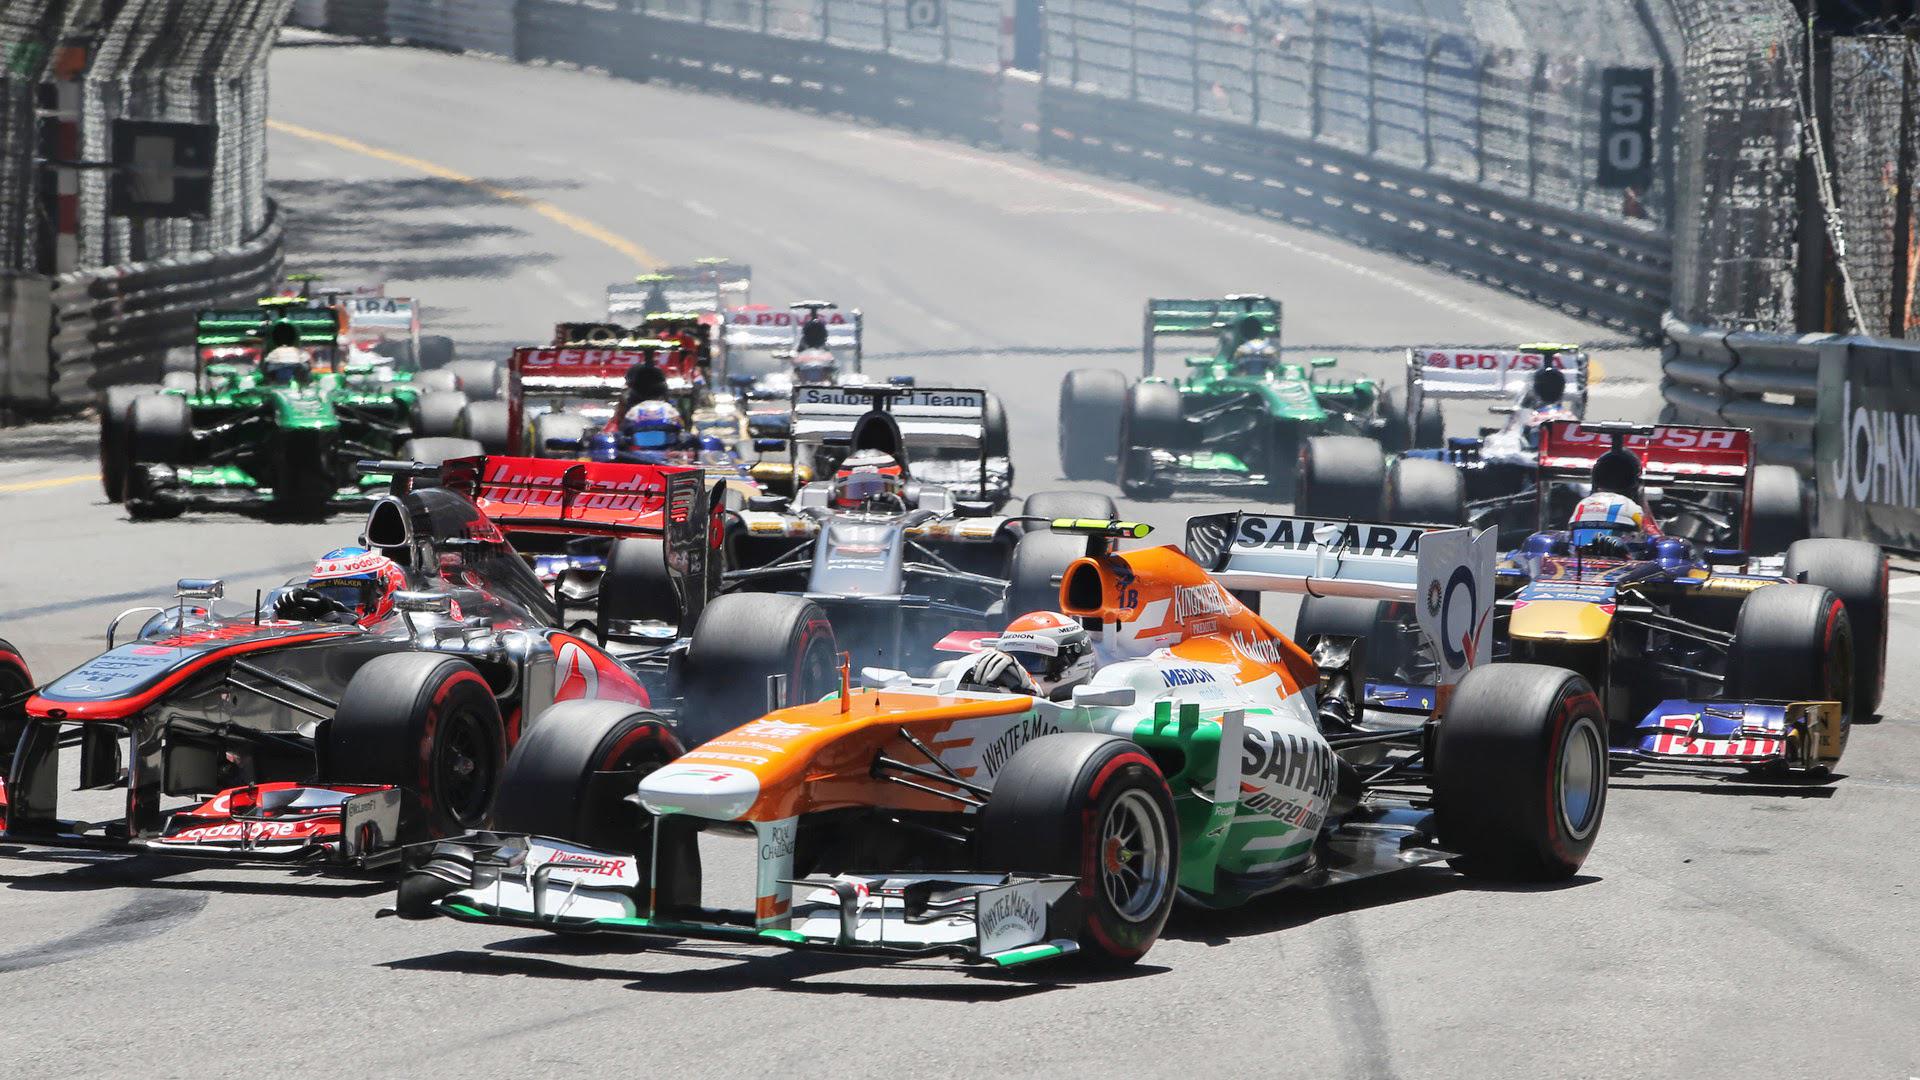 formula 1 gr prix race desktop wallpaper 1920x1080